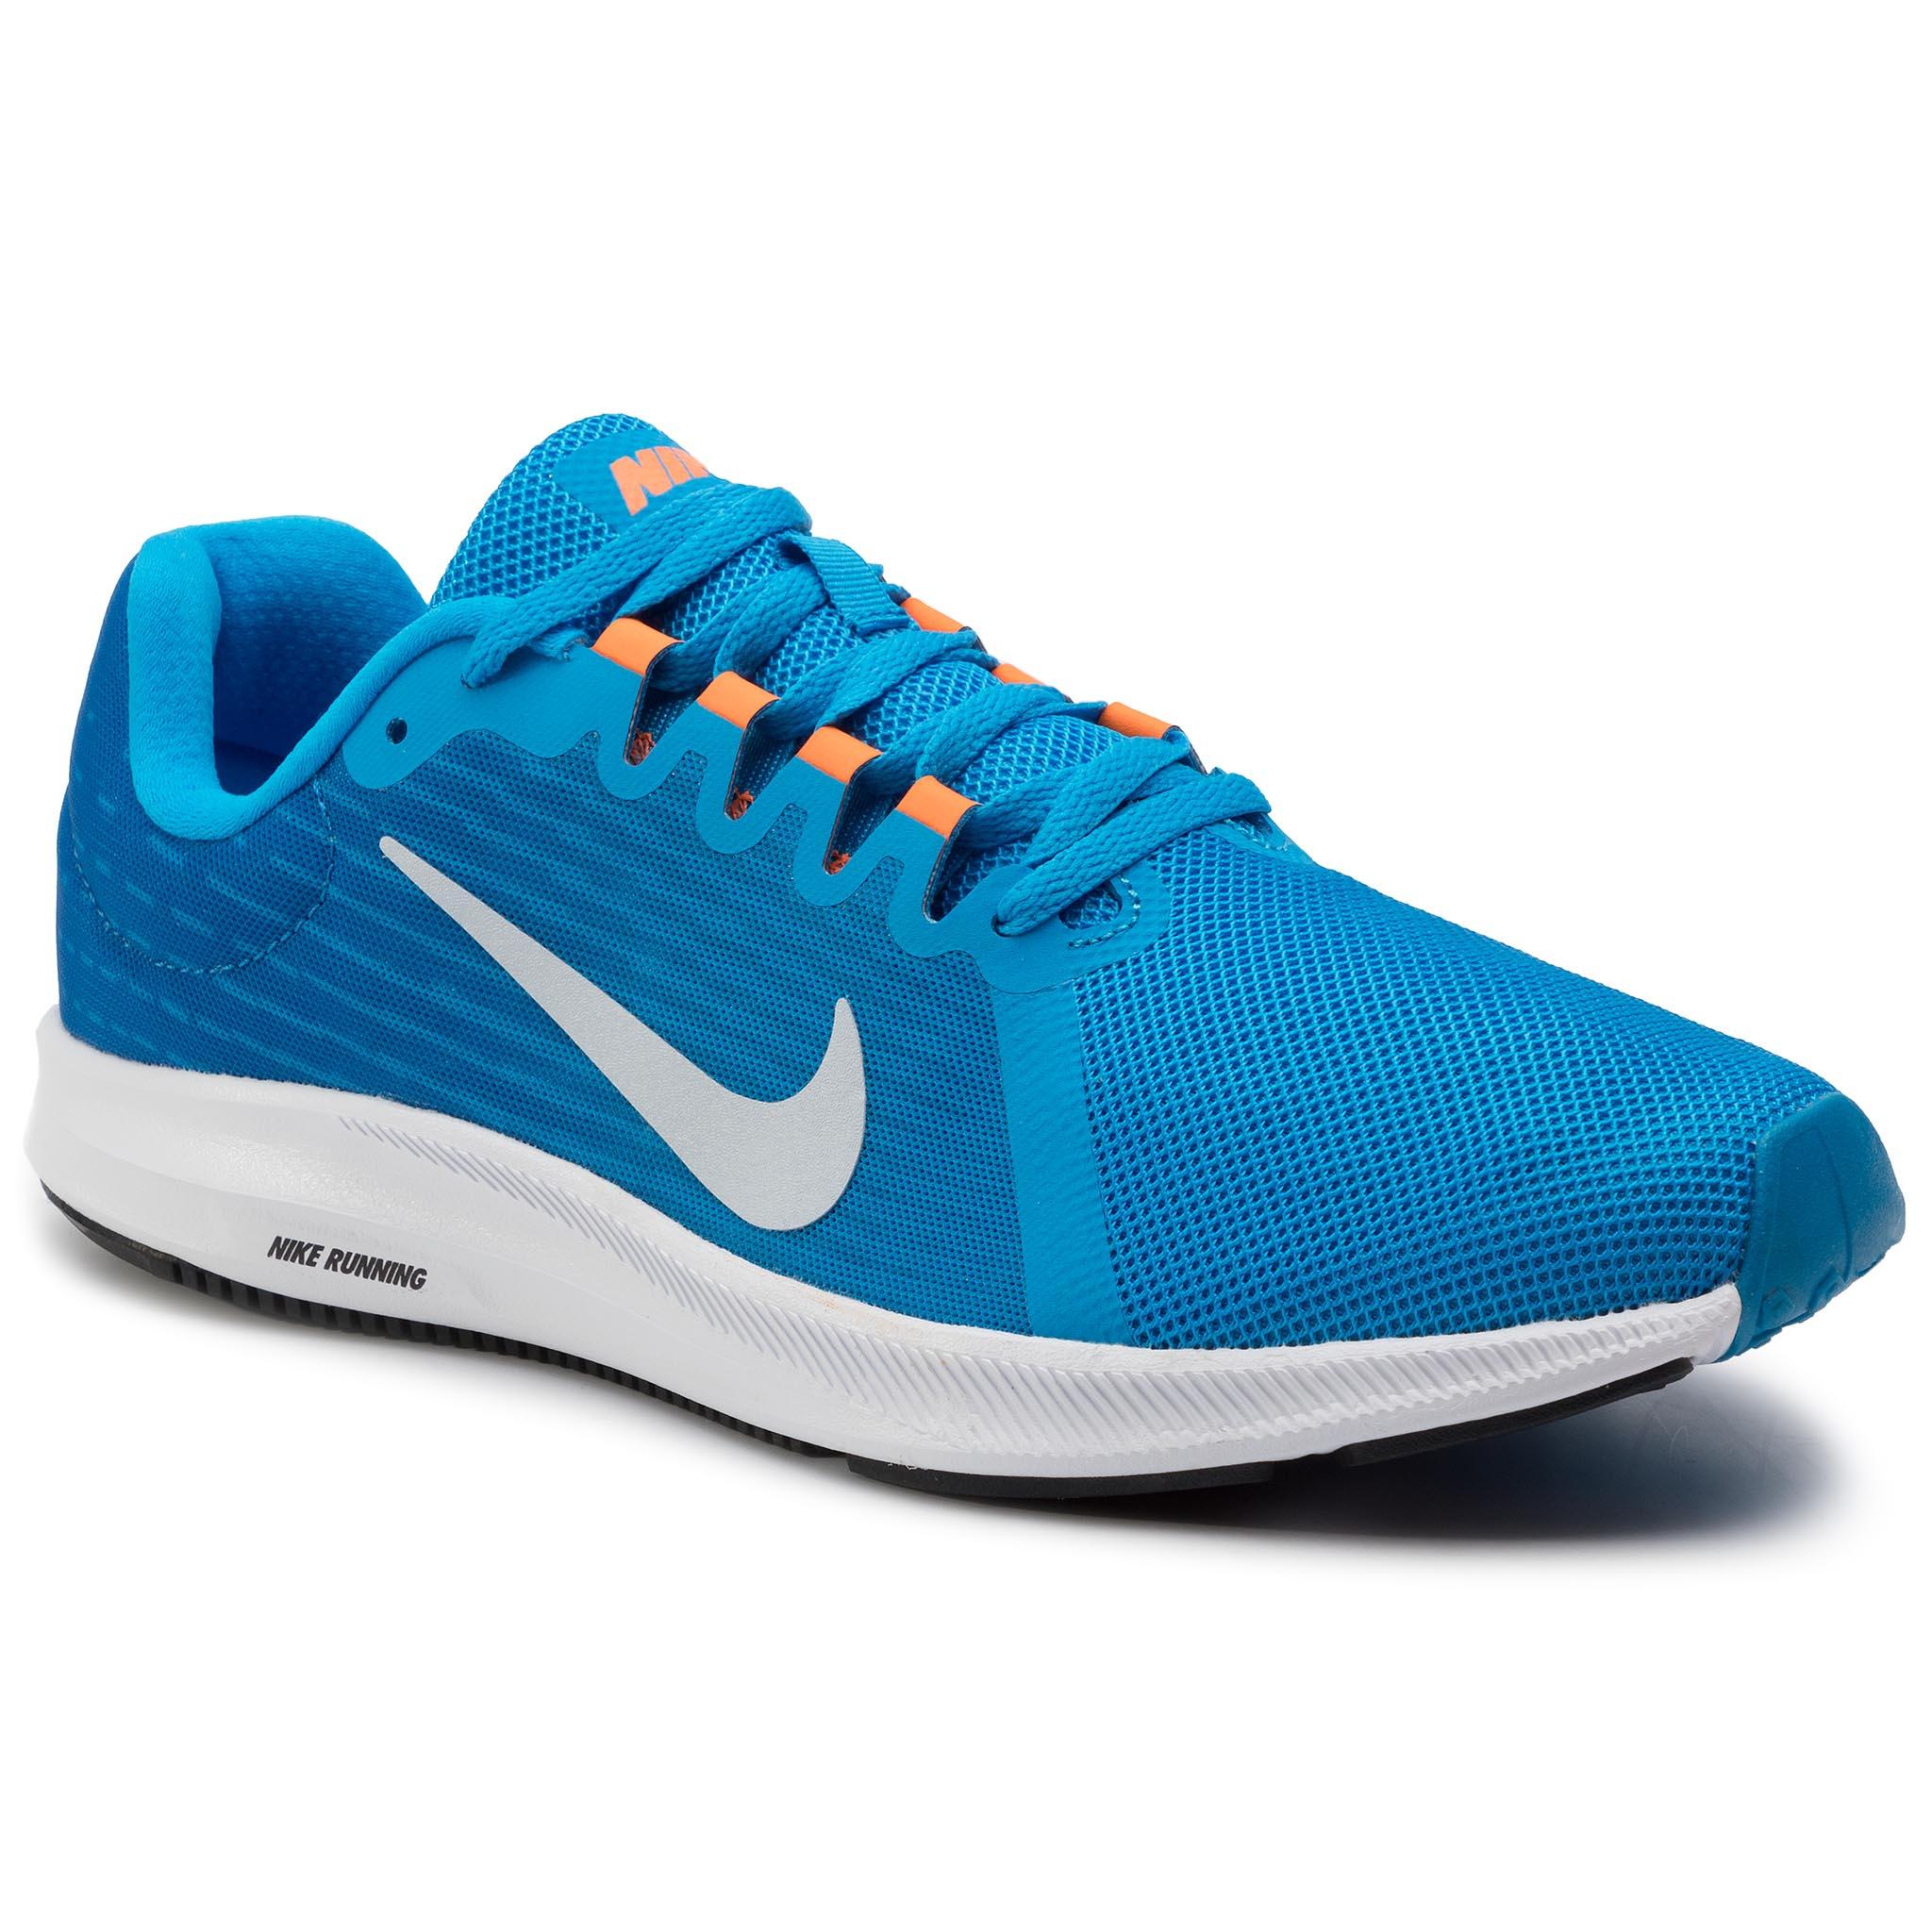 Chaussures Reebok Pt Prime Runner Fc CN5677 GreenCypress